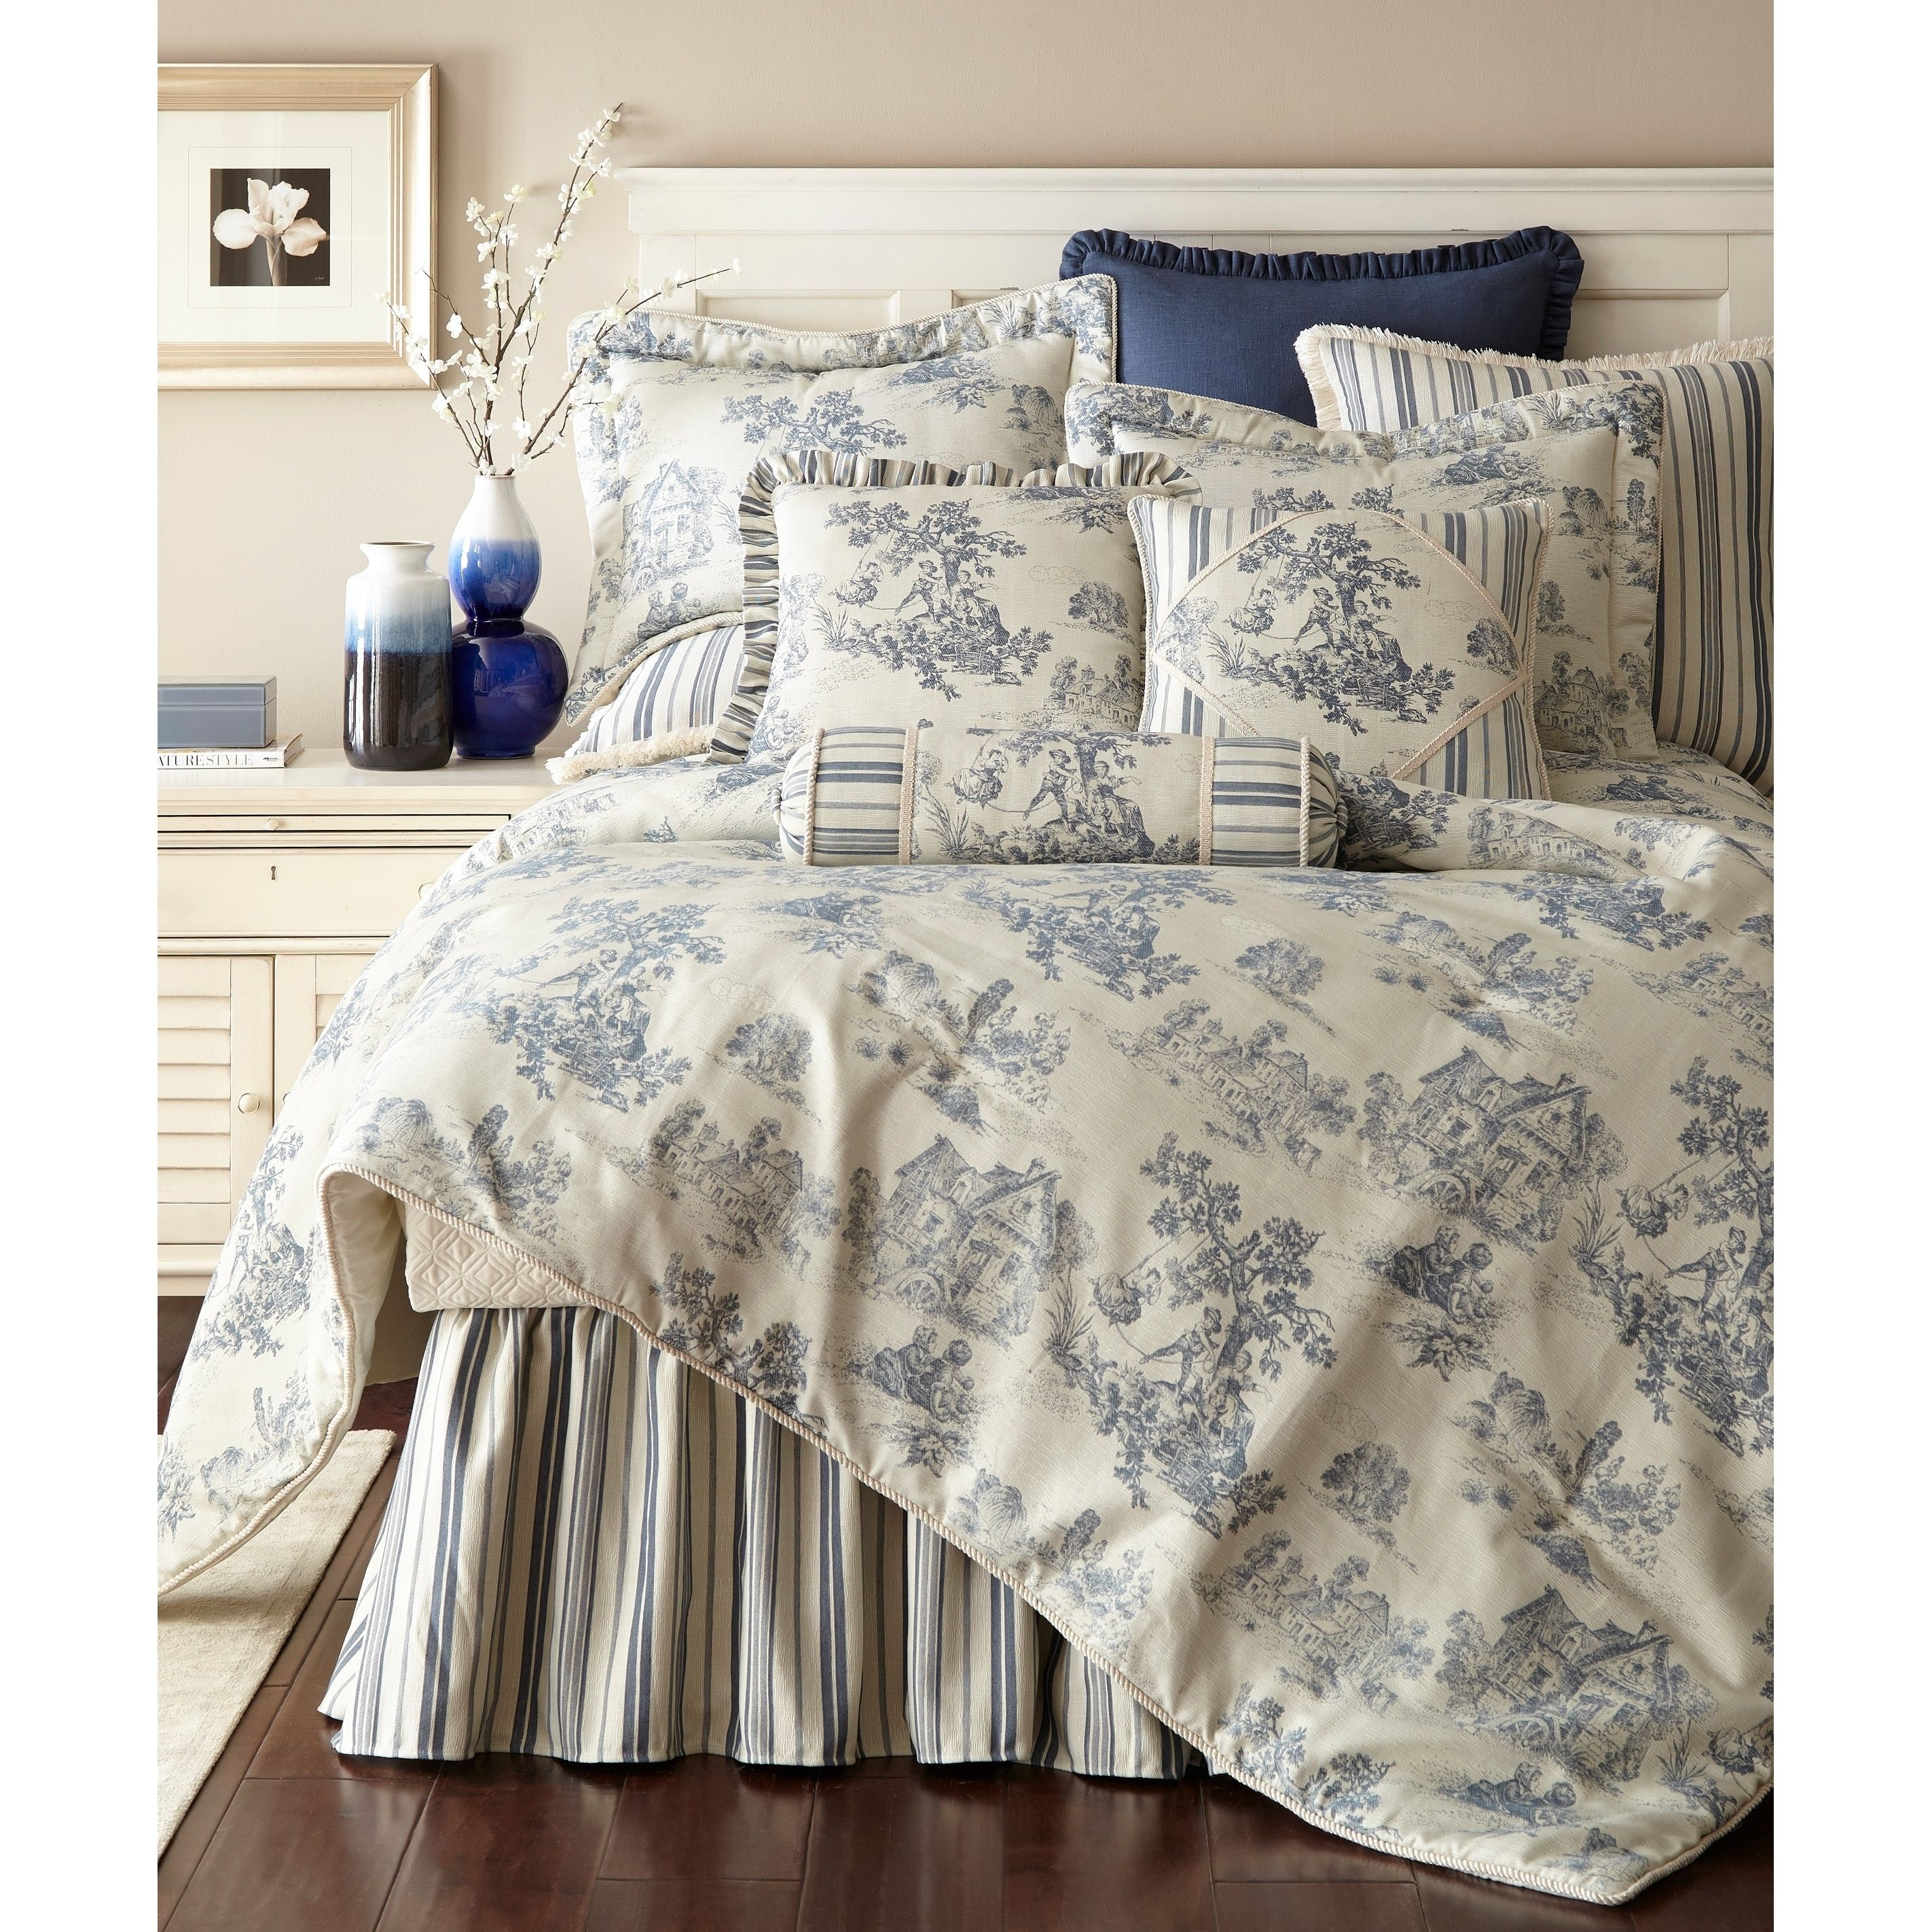 PCHF Cosmopolitan Toile 3piece Luxury Comforter Set in